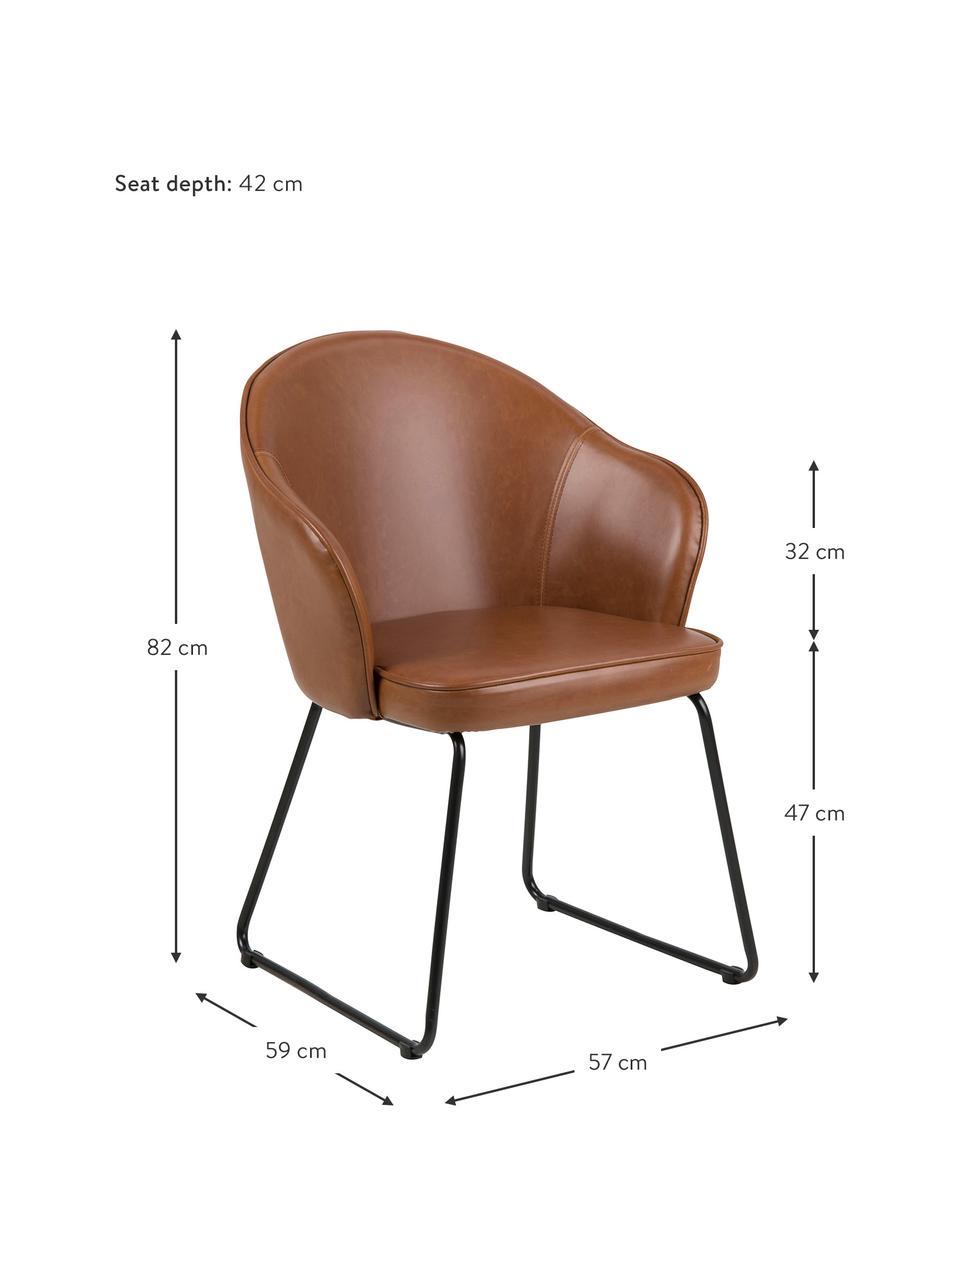 Kunstleder-Armlehnstuhl Mitzie, Bezug: Polyurethan (Kunstleder), Beine: Metall, lackiert, Kunstleder Cognac, Beine Schwarz, B 57 x T 59 cm